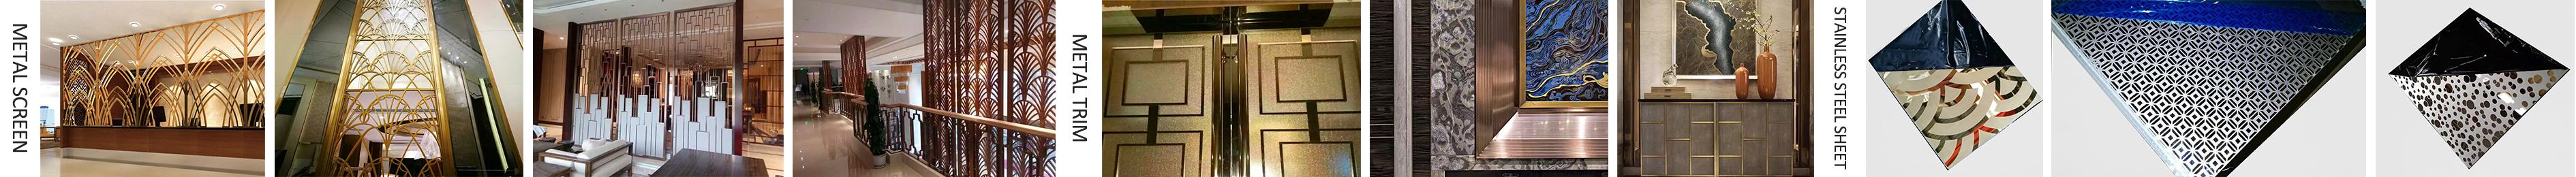 Foshan Xin Tai Jia Stainless Steel Company Limited - mirror ...